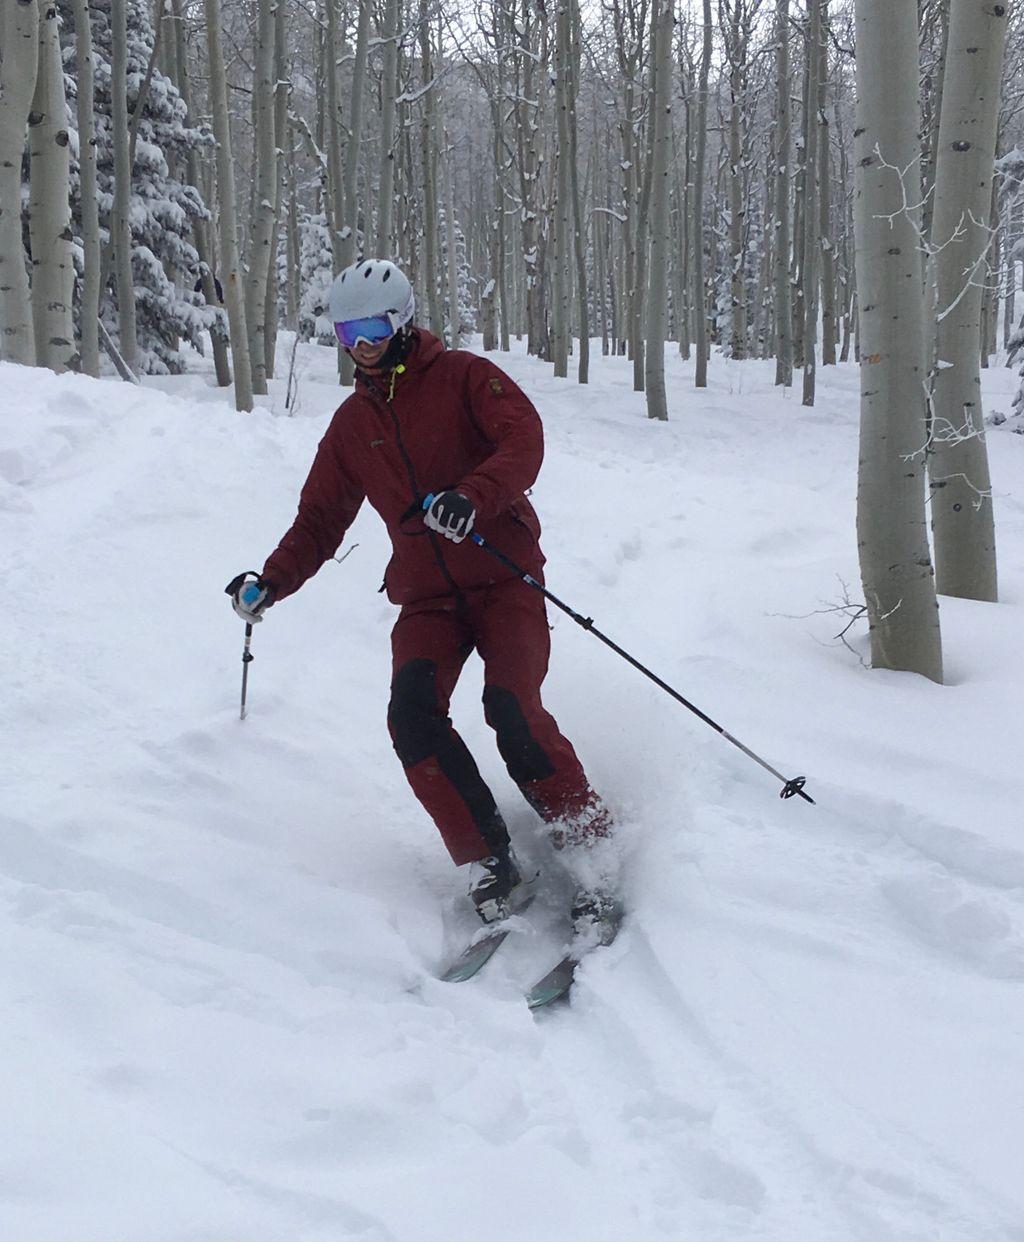 https://cdn.wintersport.nl/forum/25/4e851c3a0ceb3bc8454f0fe8...